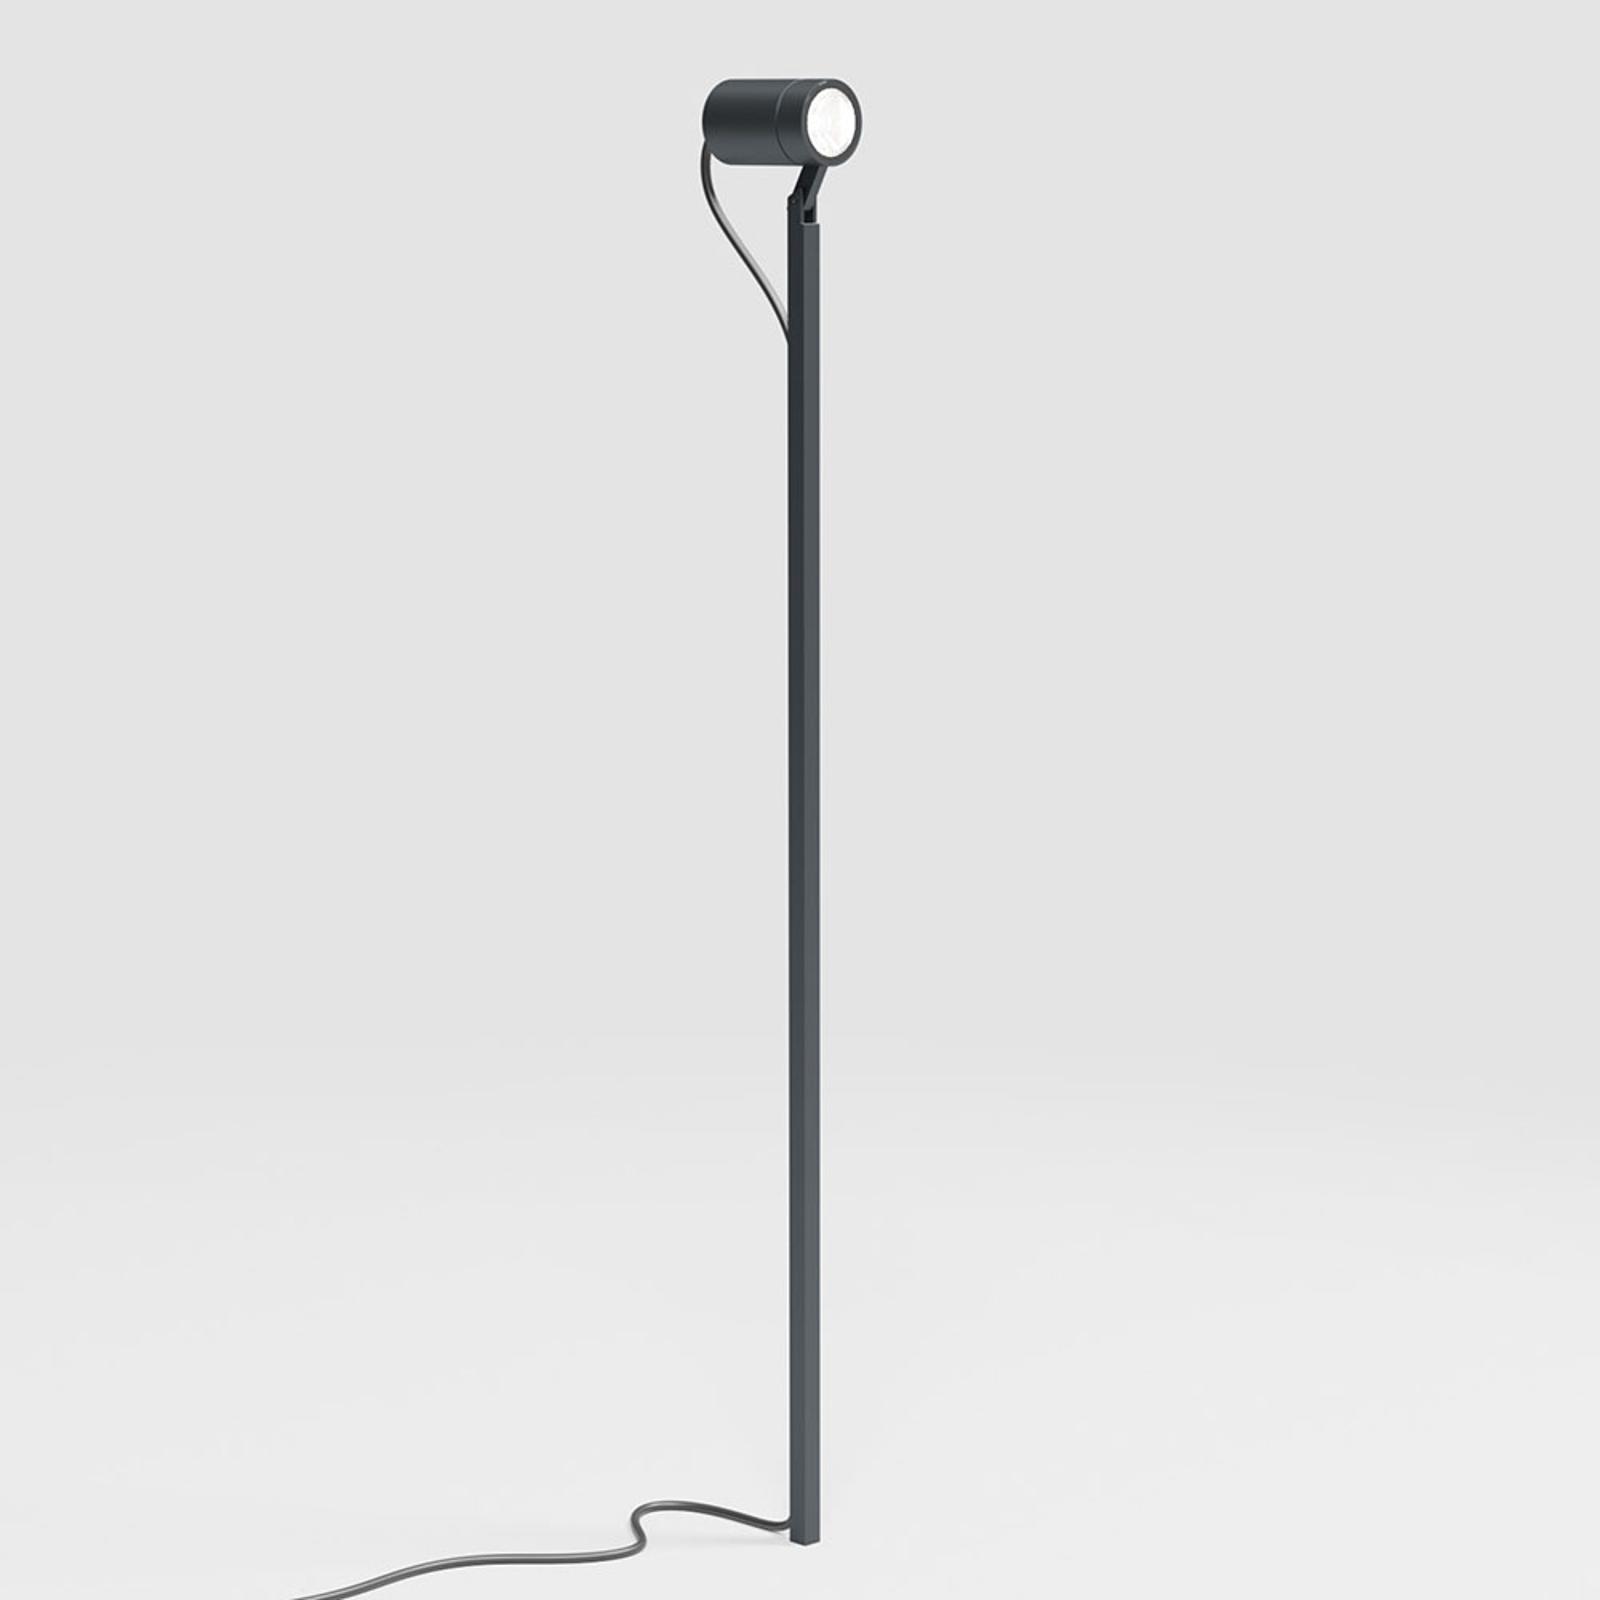 IP44.de piek 100 spotLED picchetto antracite 100cm